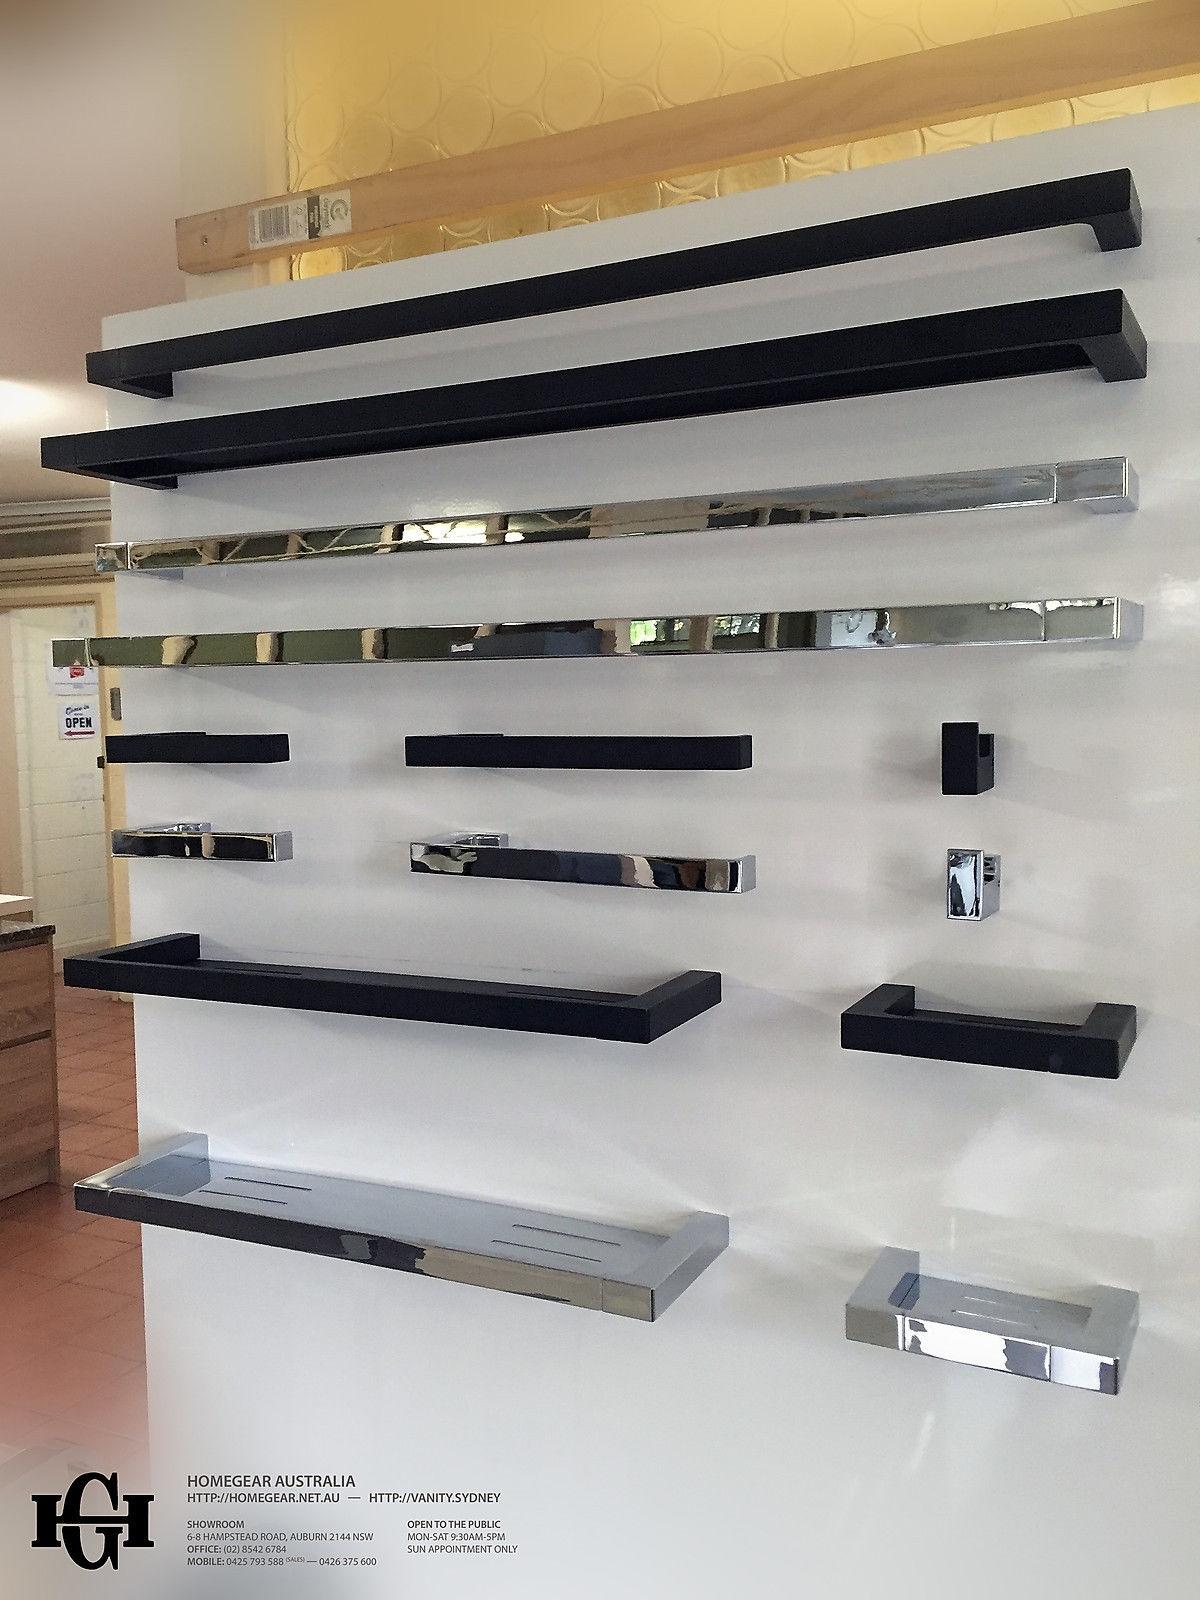 Modern Square Polished Chrome Metal Shower TrayShelfRack Bathroom